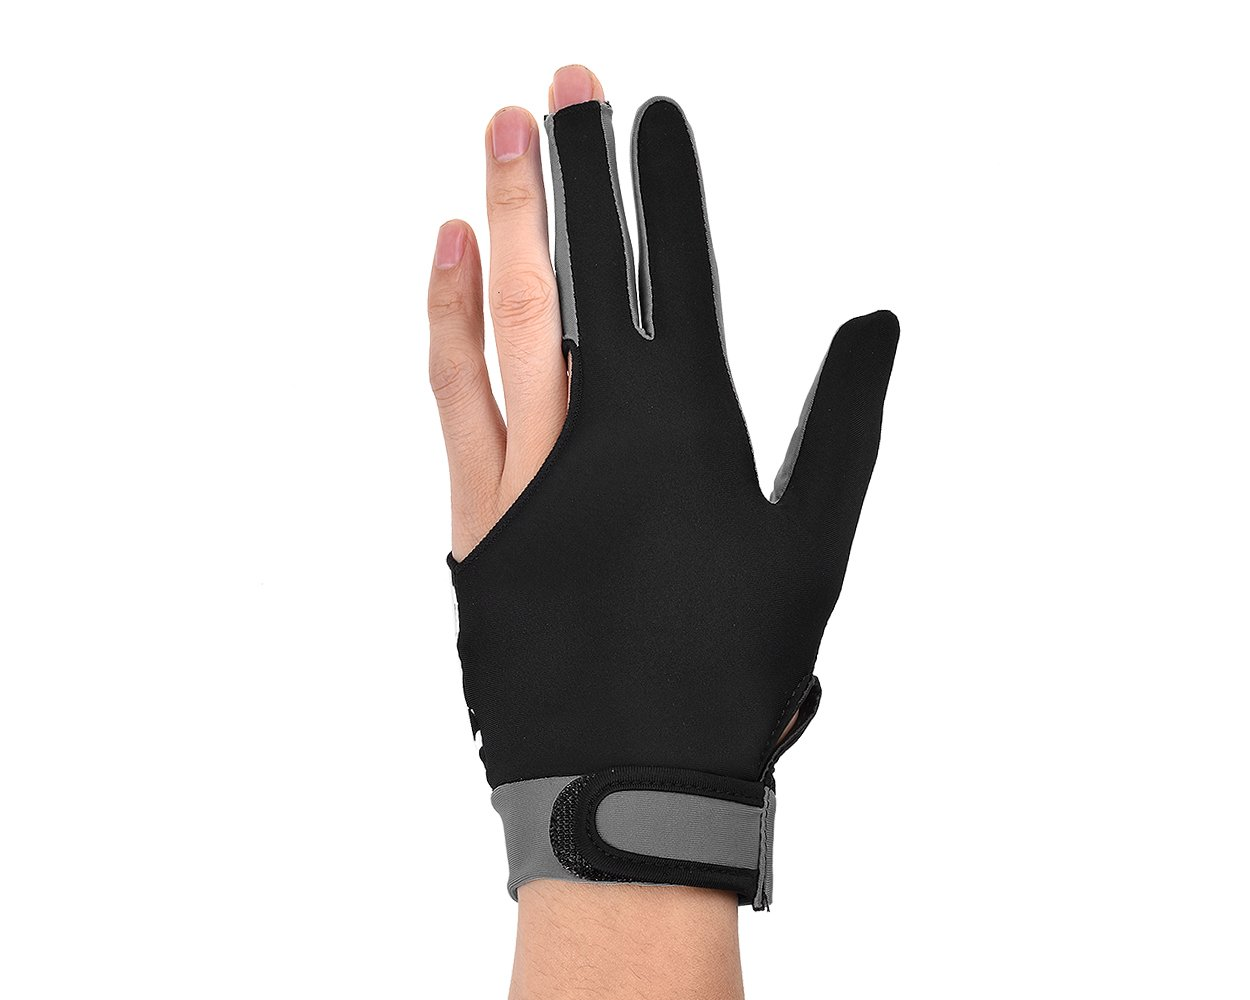 Gris DSstyles 1 pi/èce Elastic Lycra 3 Fingers Pool and Billiard Snooker Glove taille M